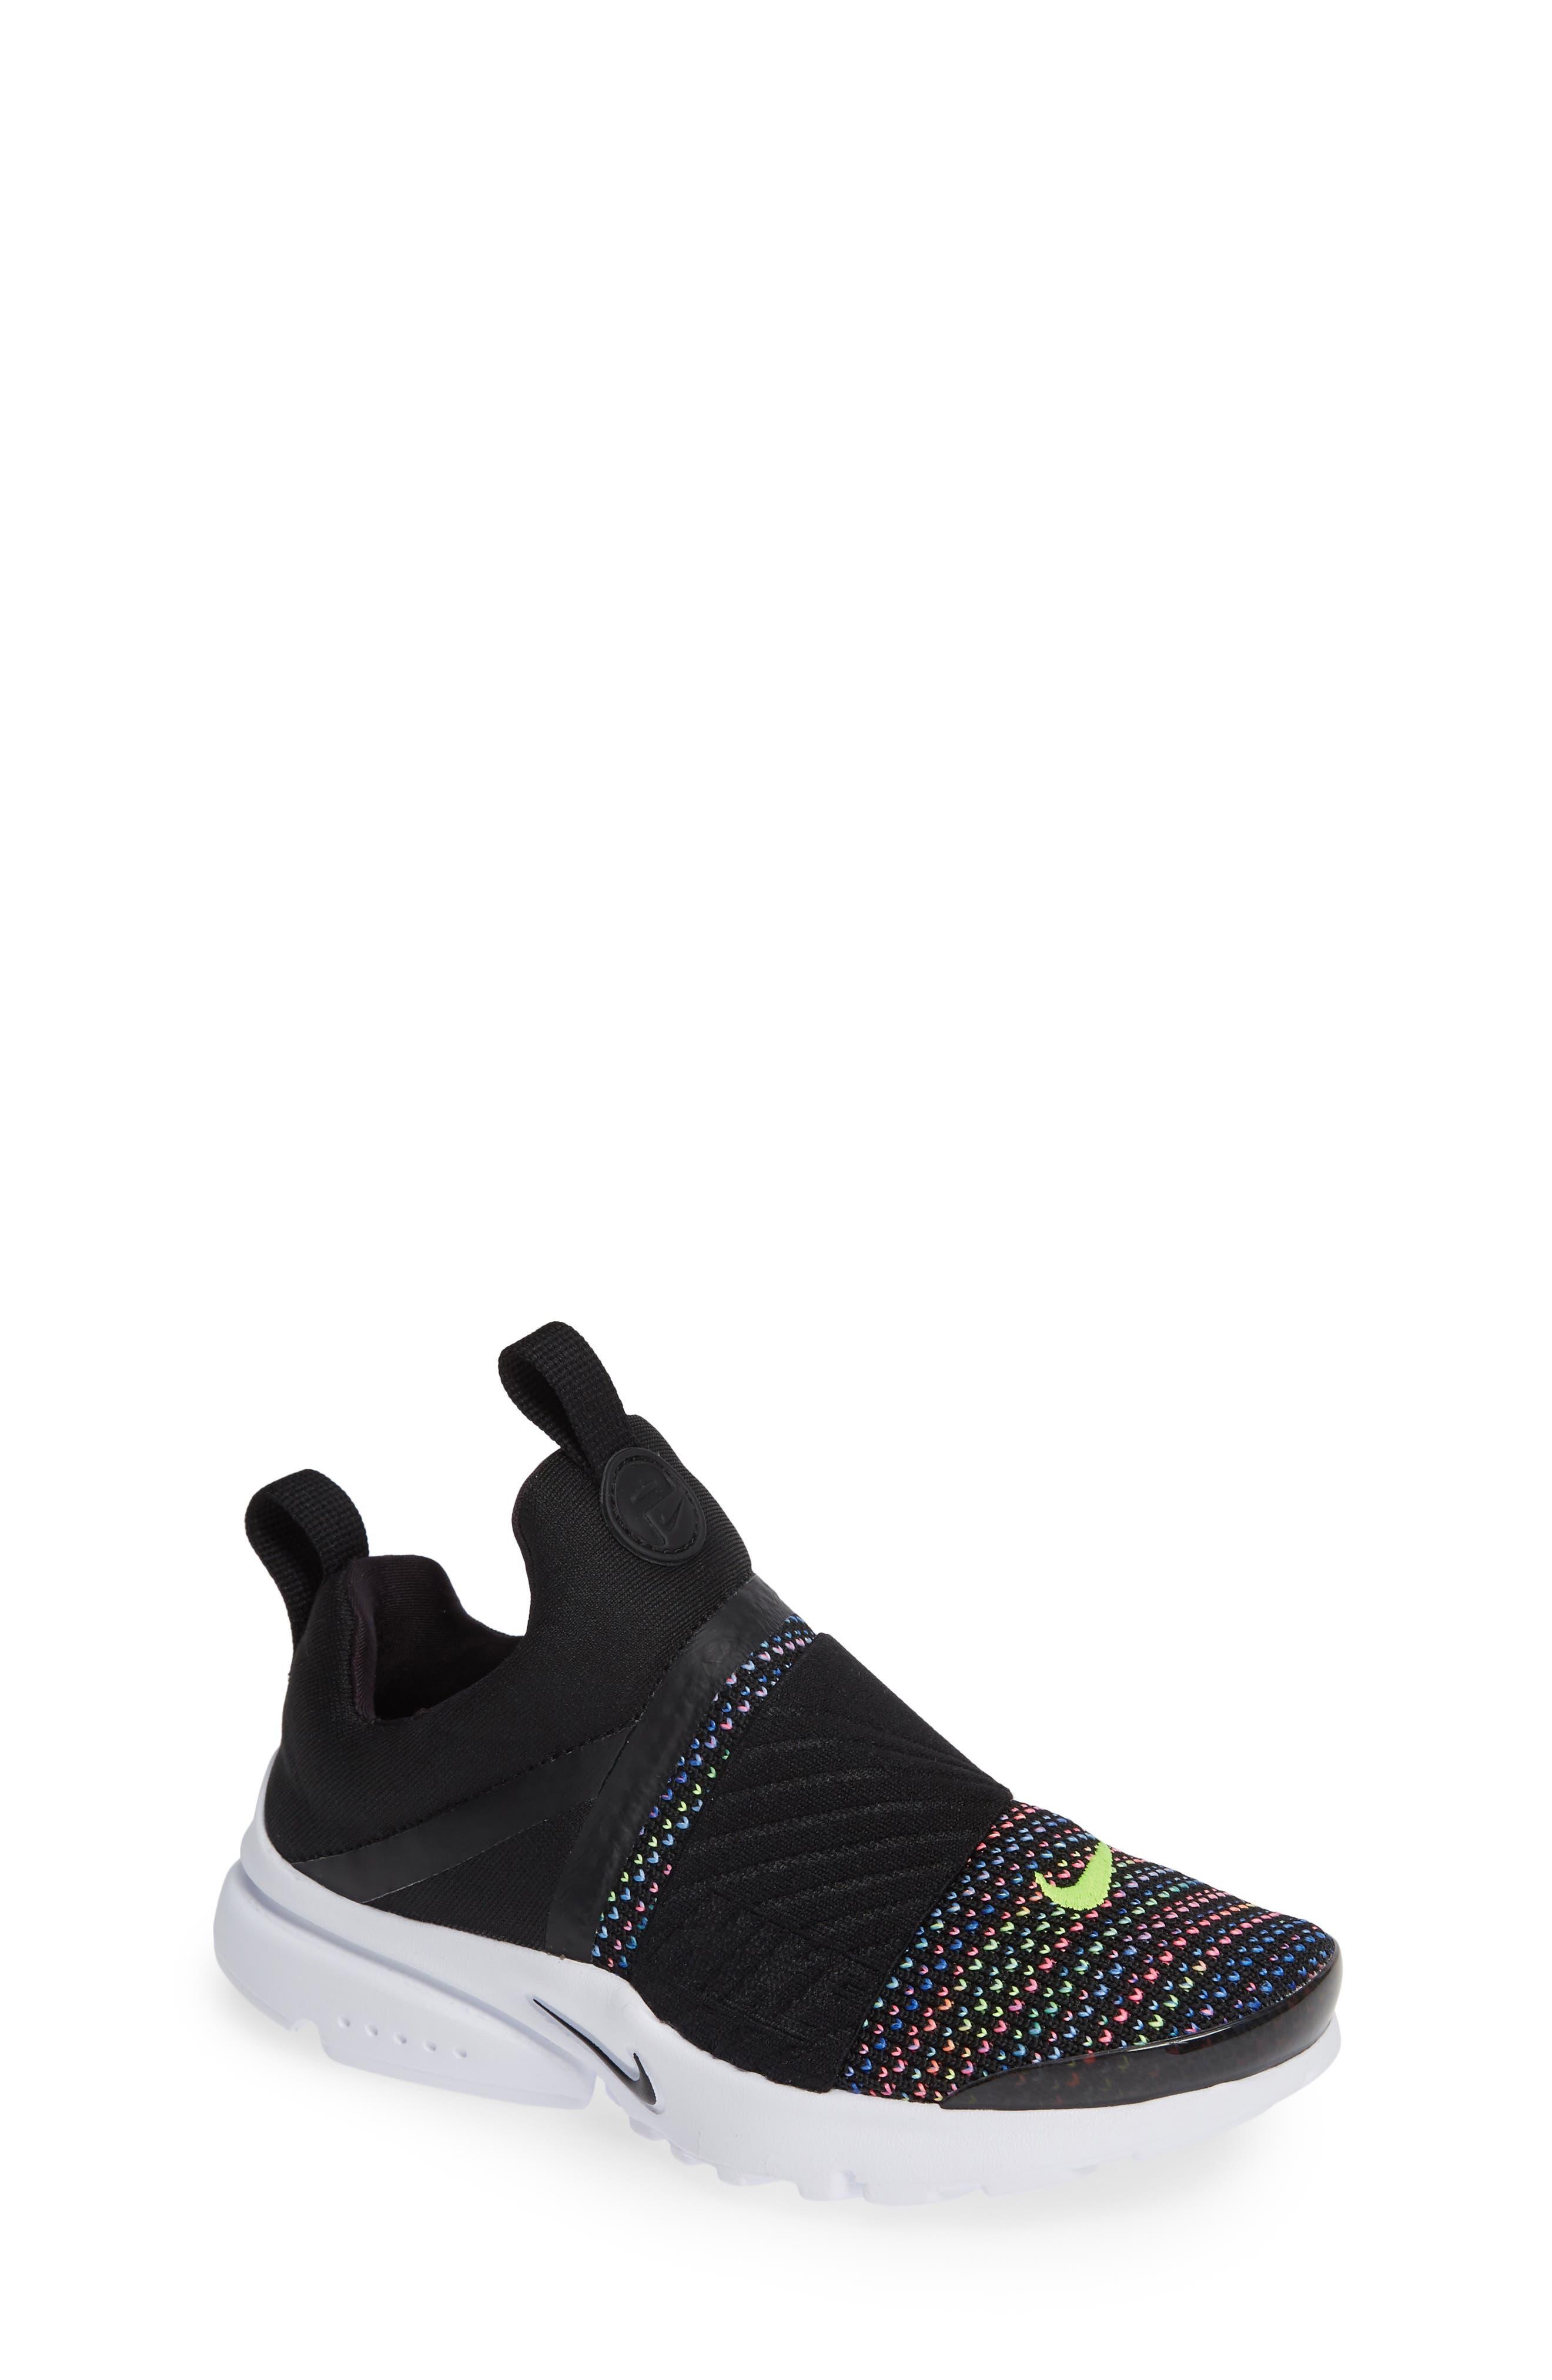 Presto Extreme SE Sneaker,                             Main thumbnail 1, color,                             001